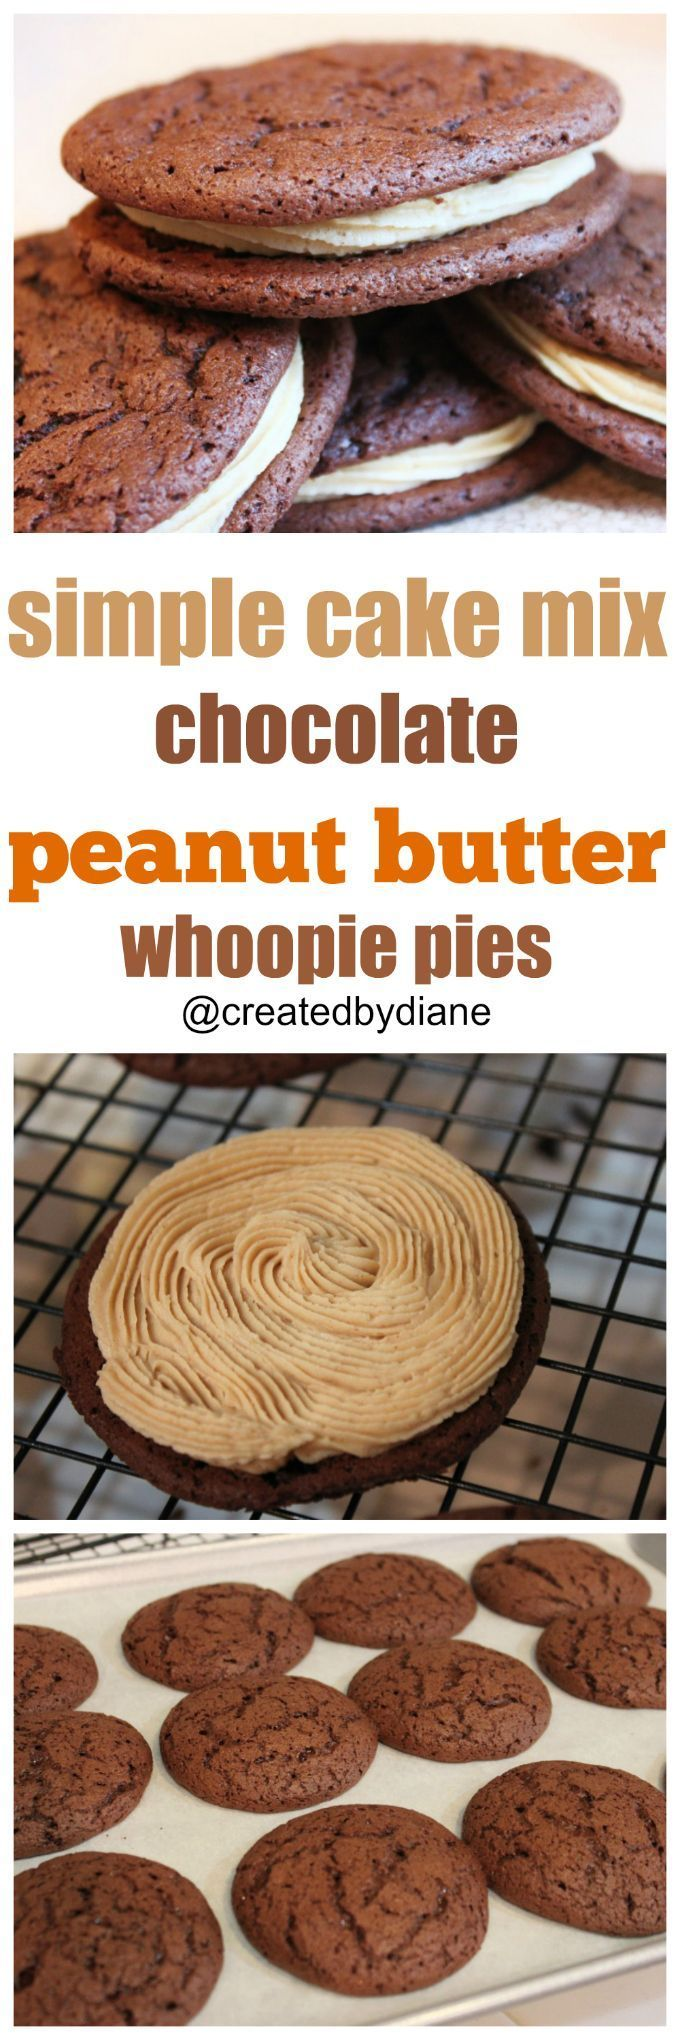 Babycakes Whoopie Pie Recipes Cake Mix